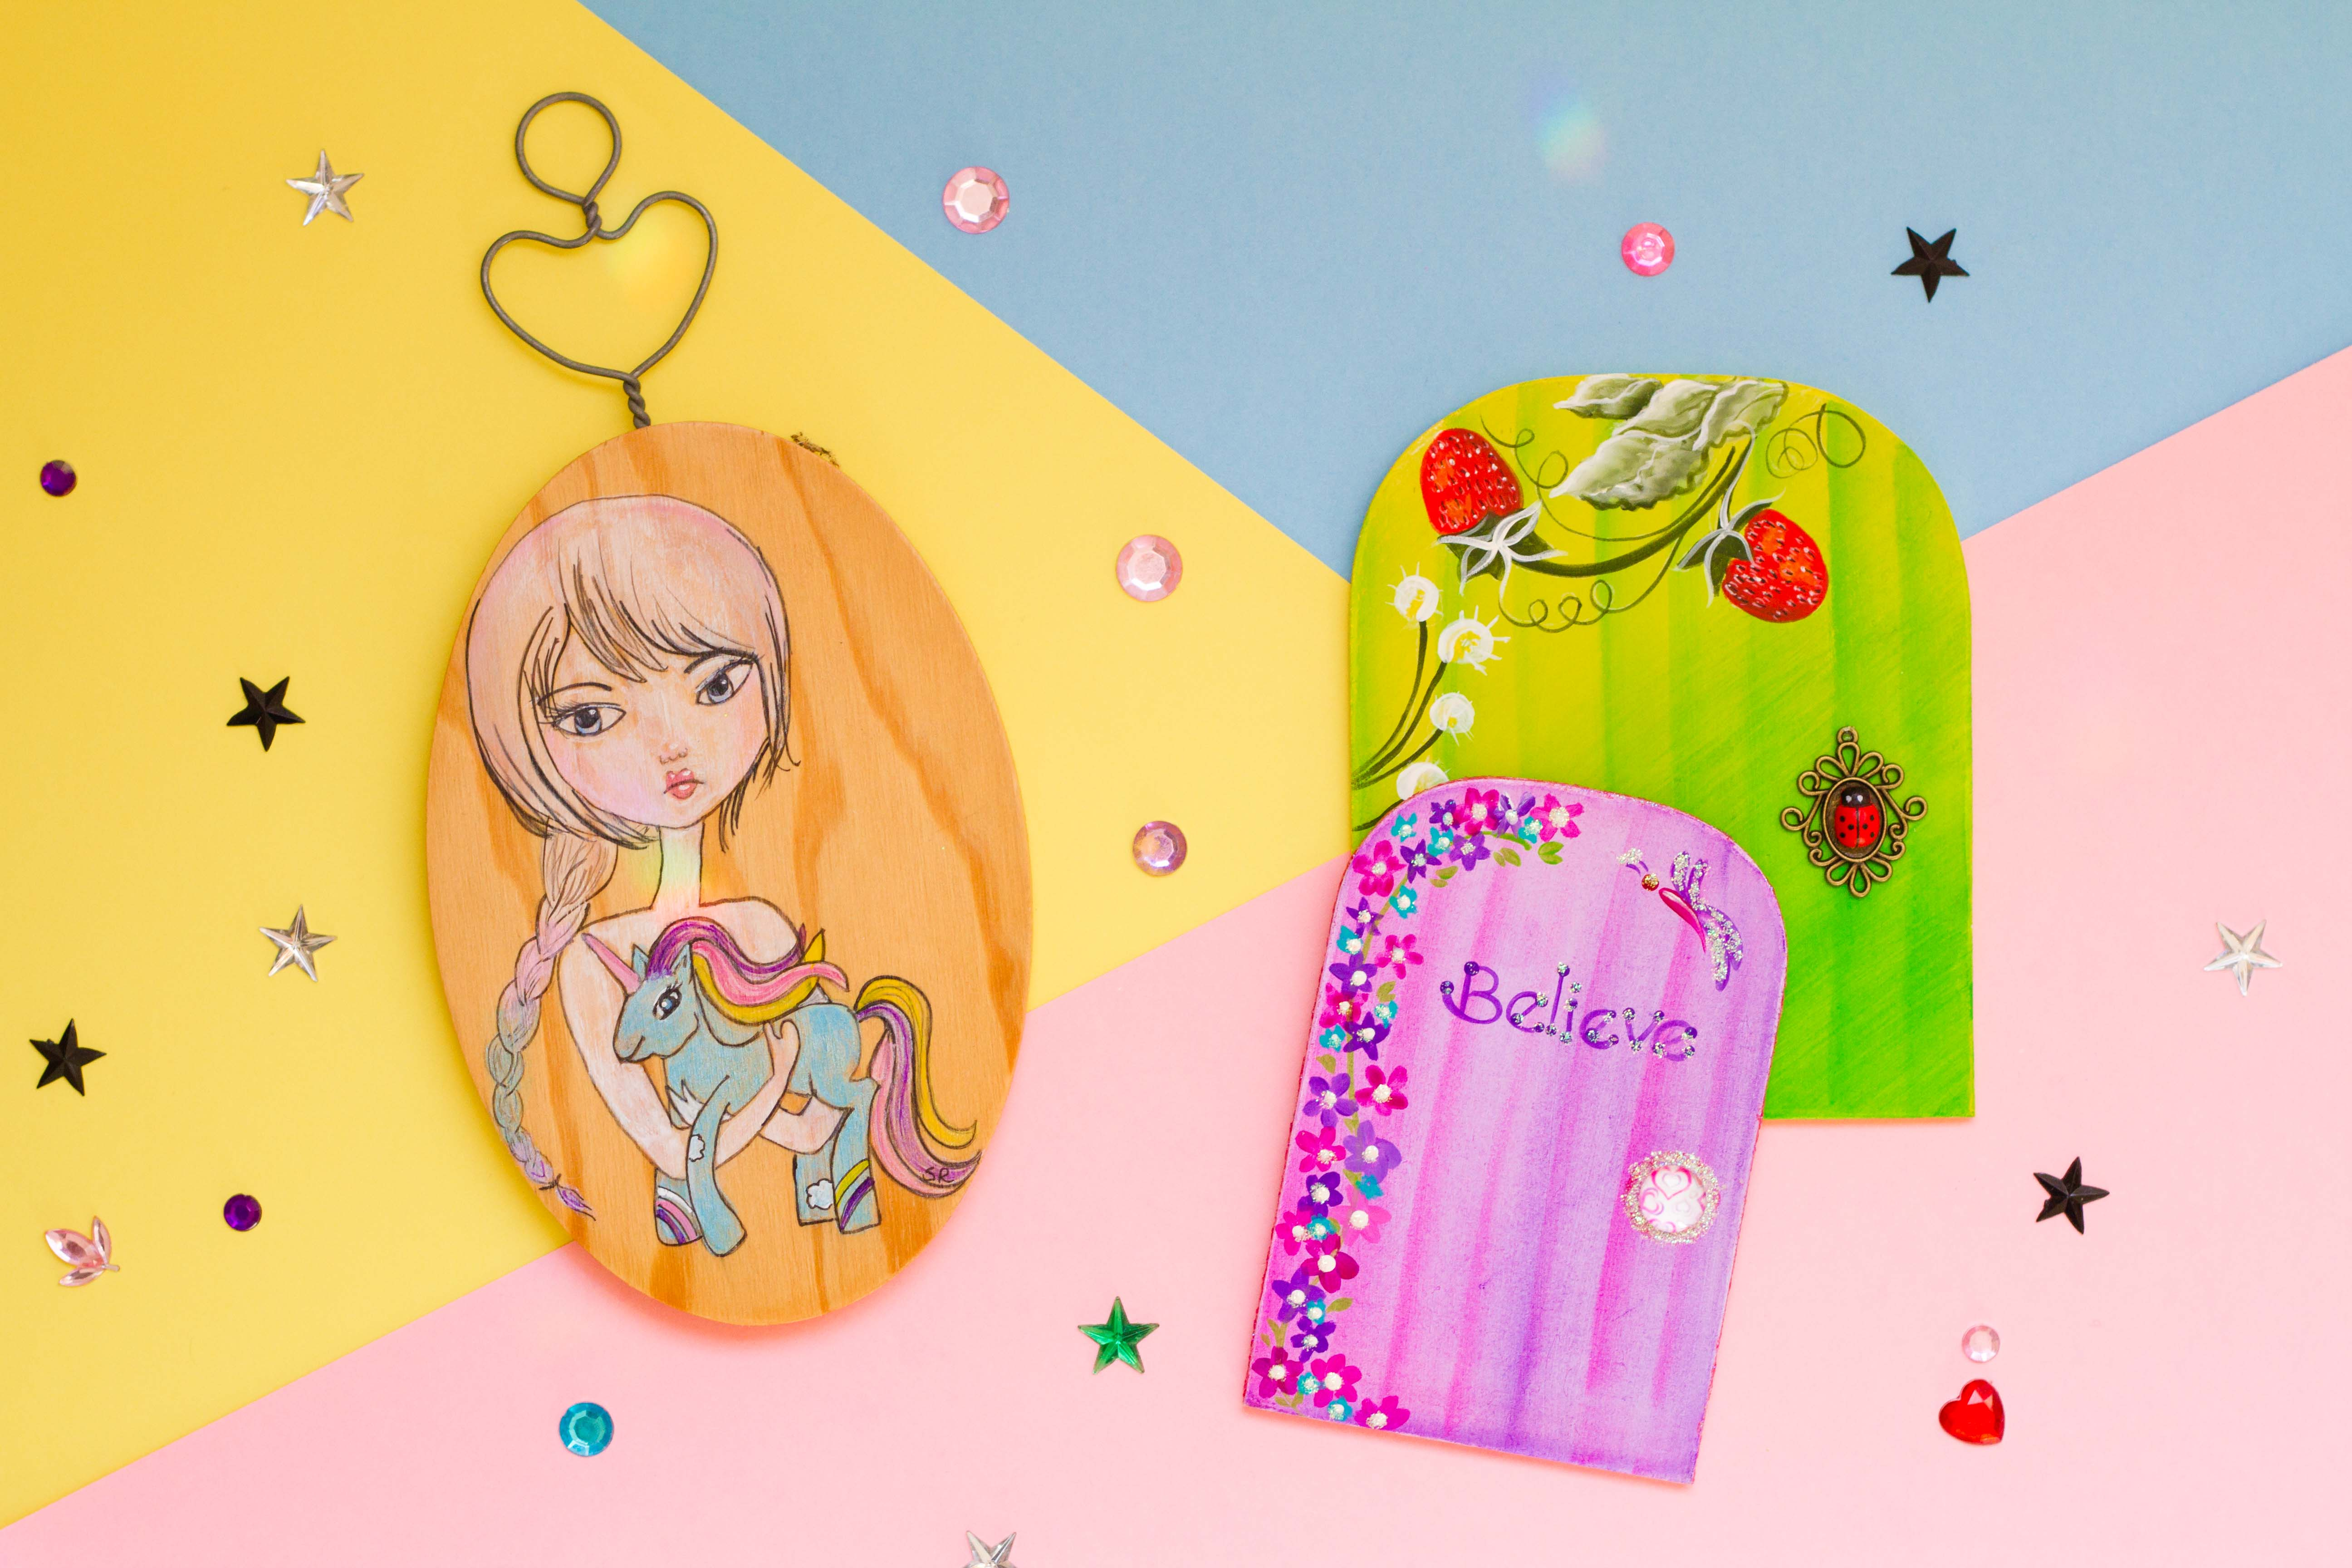 Fairy Doors and Whimsical Art